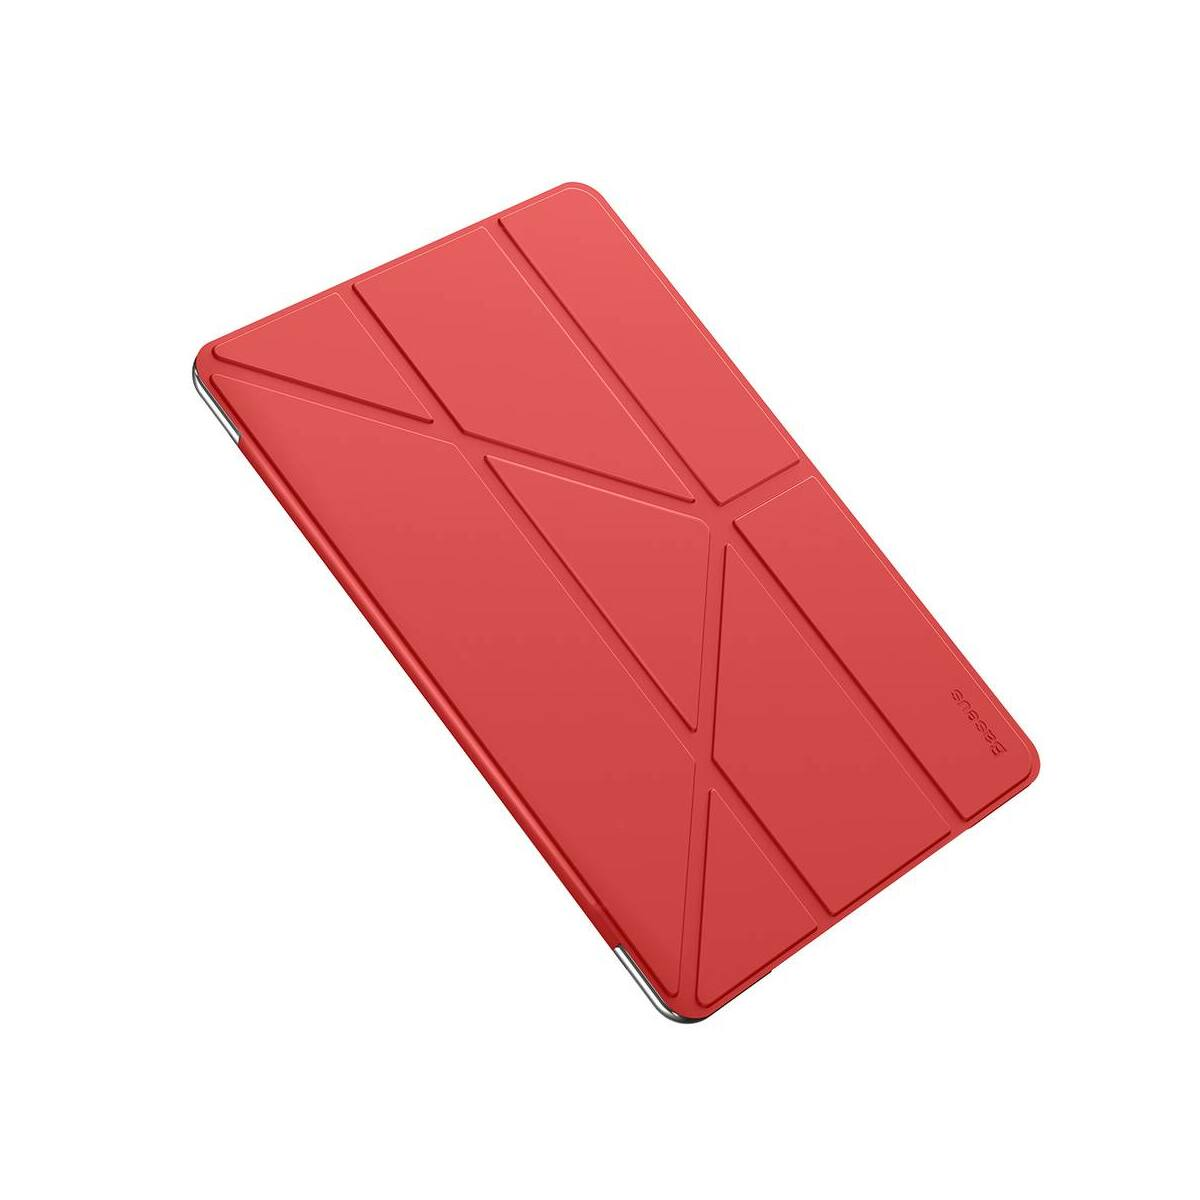 "Baseus iPad 10.2"" tok, Jane Y-Type bőr, smart bőr kijelzővédő tok, piros (LTAPIPD-G09)"